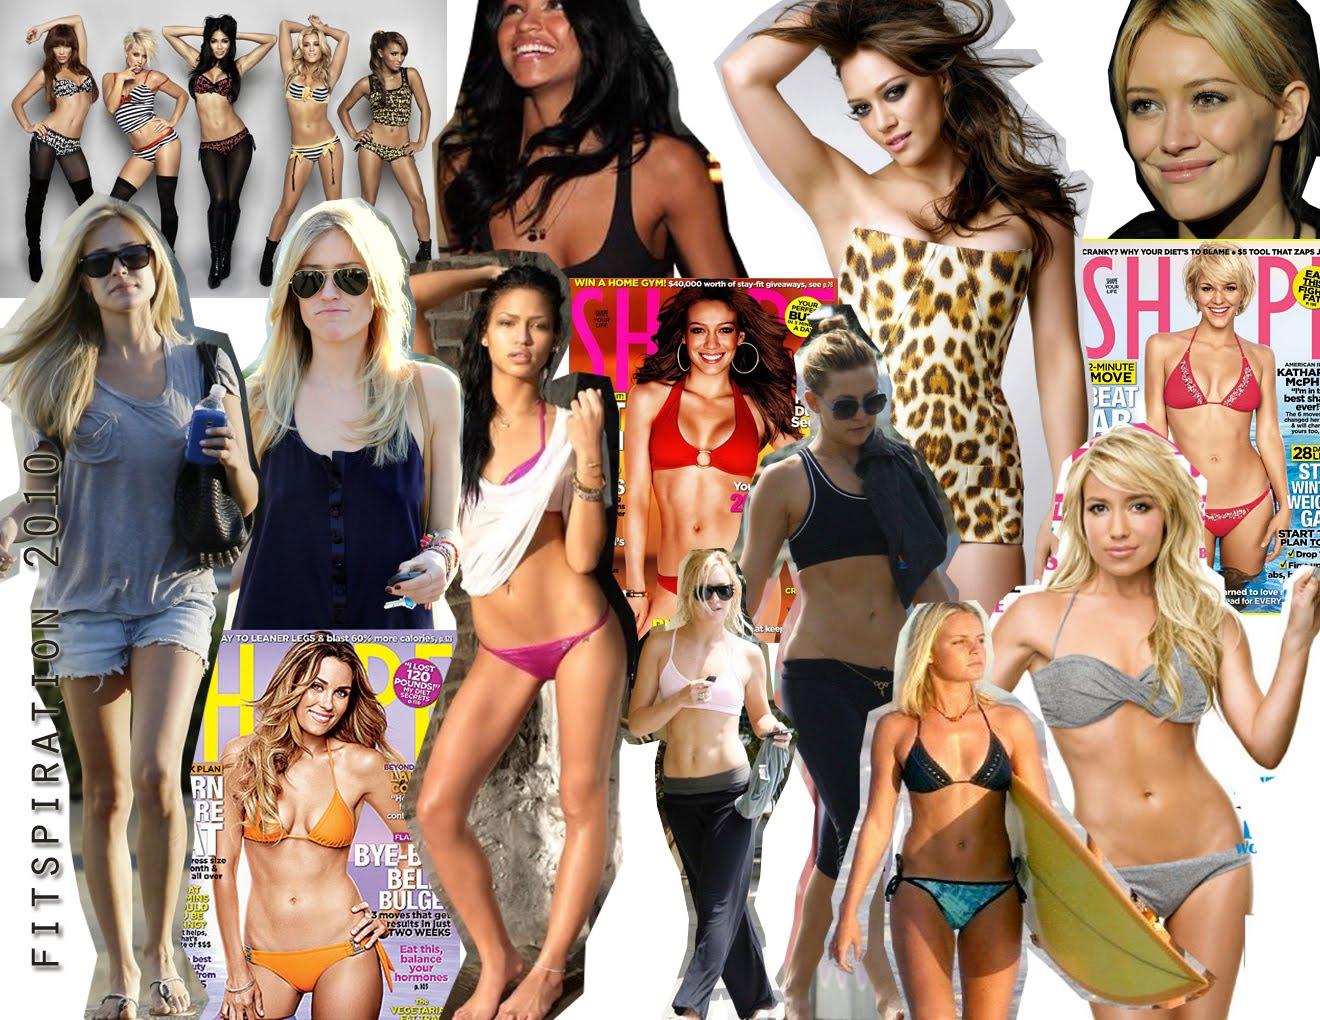 http://2.bp.blogspot.com/_cLsM-o6y1Ag/THmpX7g_kcI/AAAAAAAAAAw/m-fcEhlCGnA/s1600/2010FIT.jpg